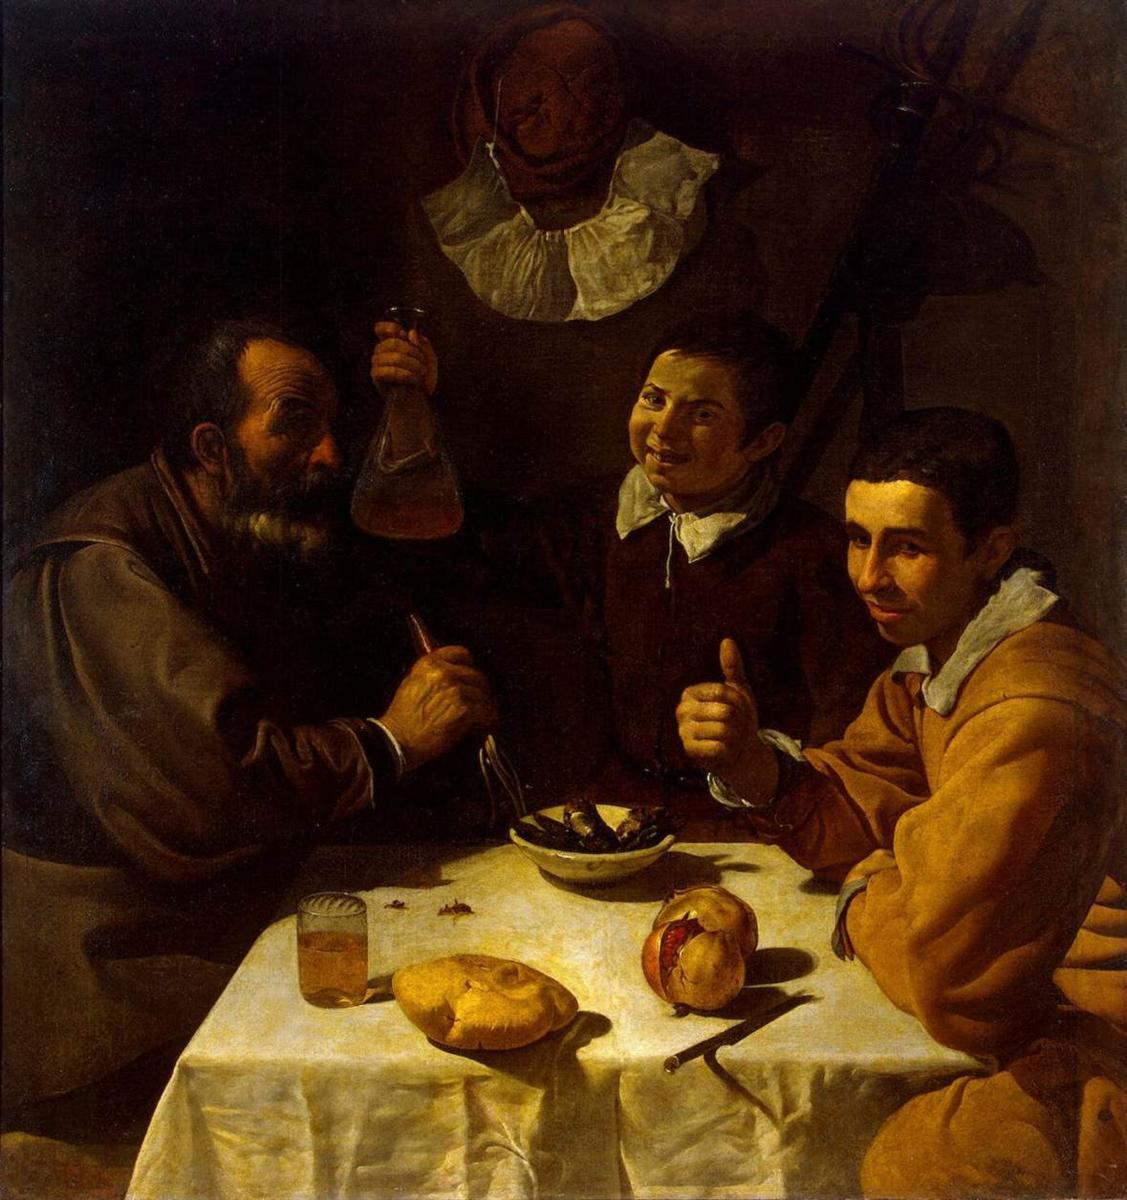 Diego vel zquez baroque era painter tutt 39 art for Famous artist in baroque period